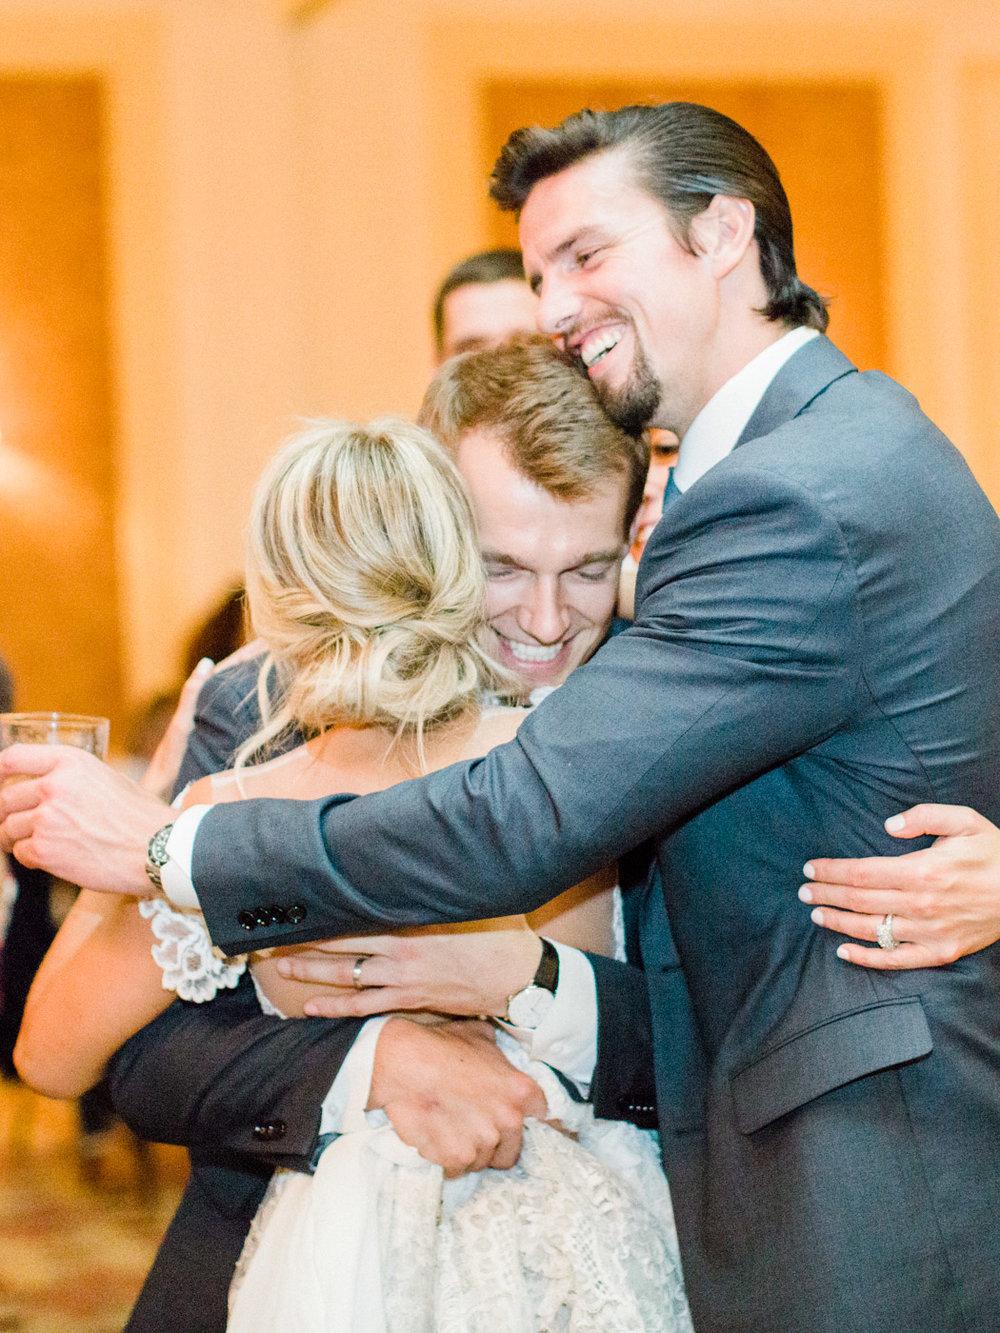 Toronto-Muskoka-wedding-photographer-summery-fun-documentary-the-marriott-rosseau134.jpg